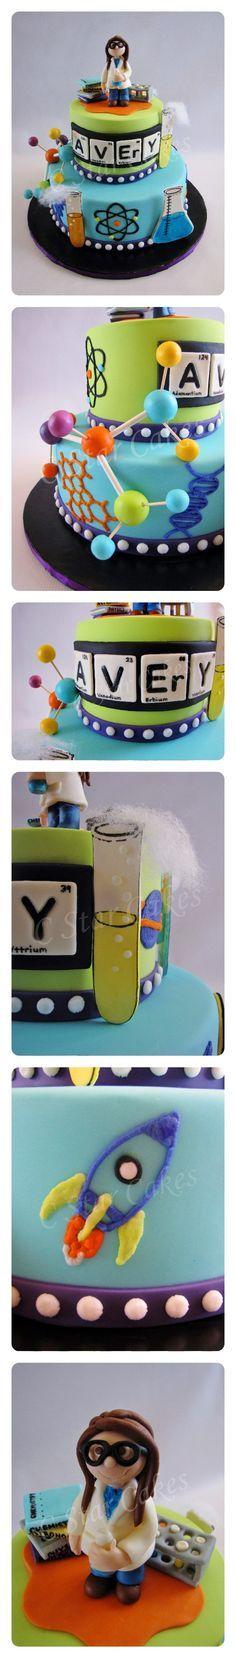 Adore Cake Decor Cakes - Art, School & Graduation ...